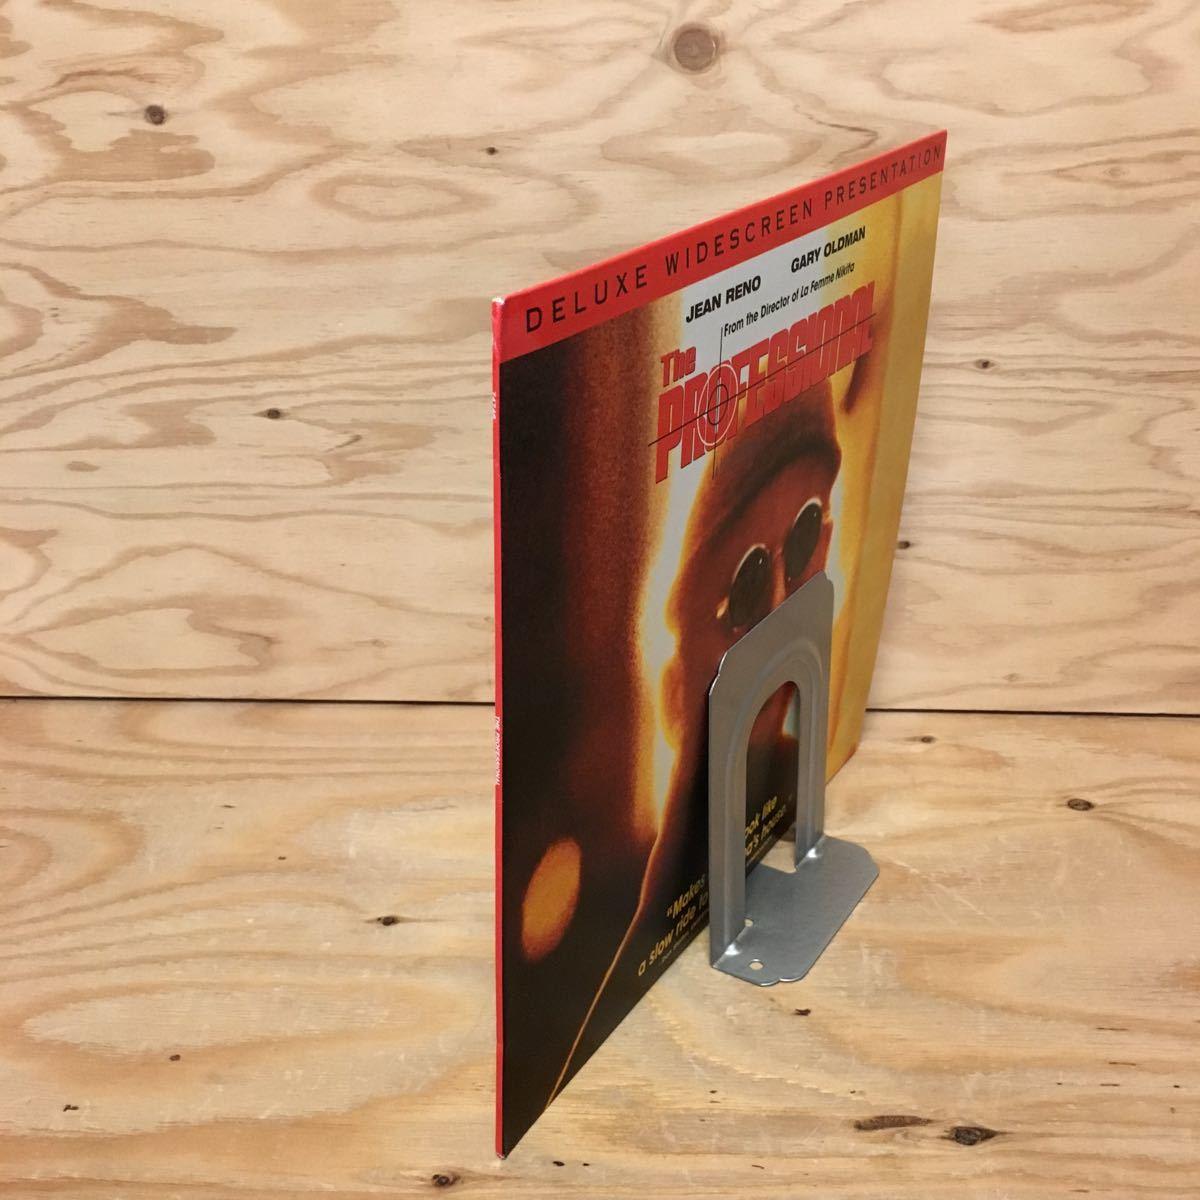 ◎Y3FIIA-200221 レア[THE PROFESSIONAL 輸入盤]LD レーザーディスク JEAN RENO LUC BESSON ワイドスクリーン_画像3